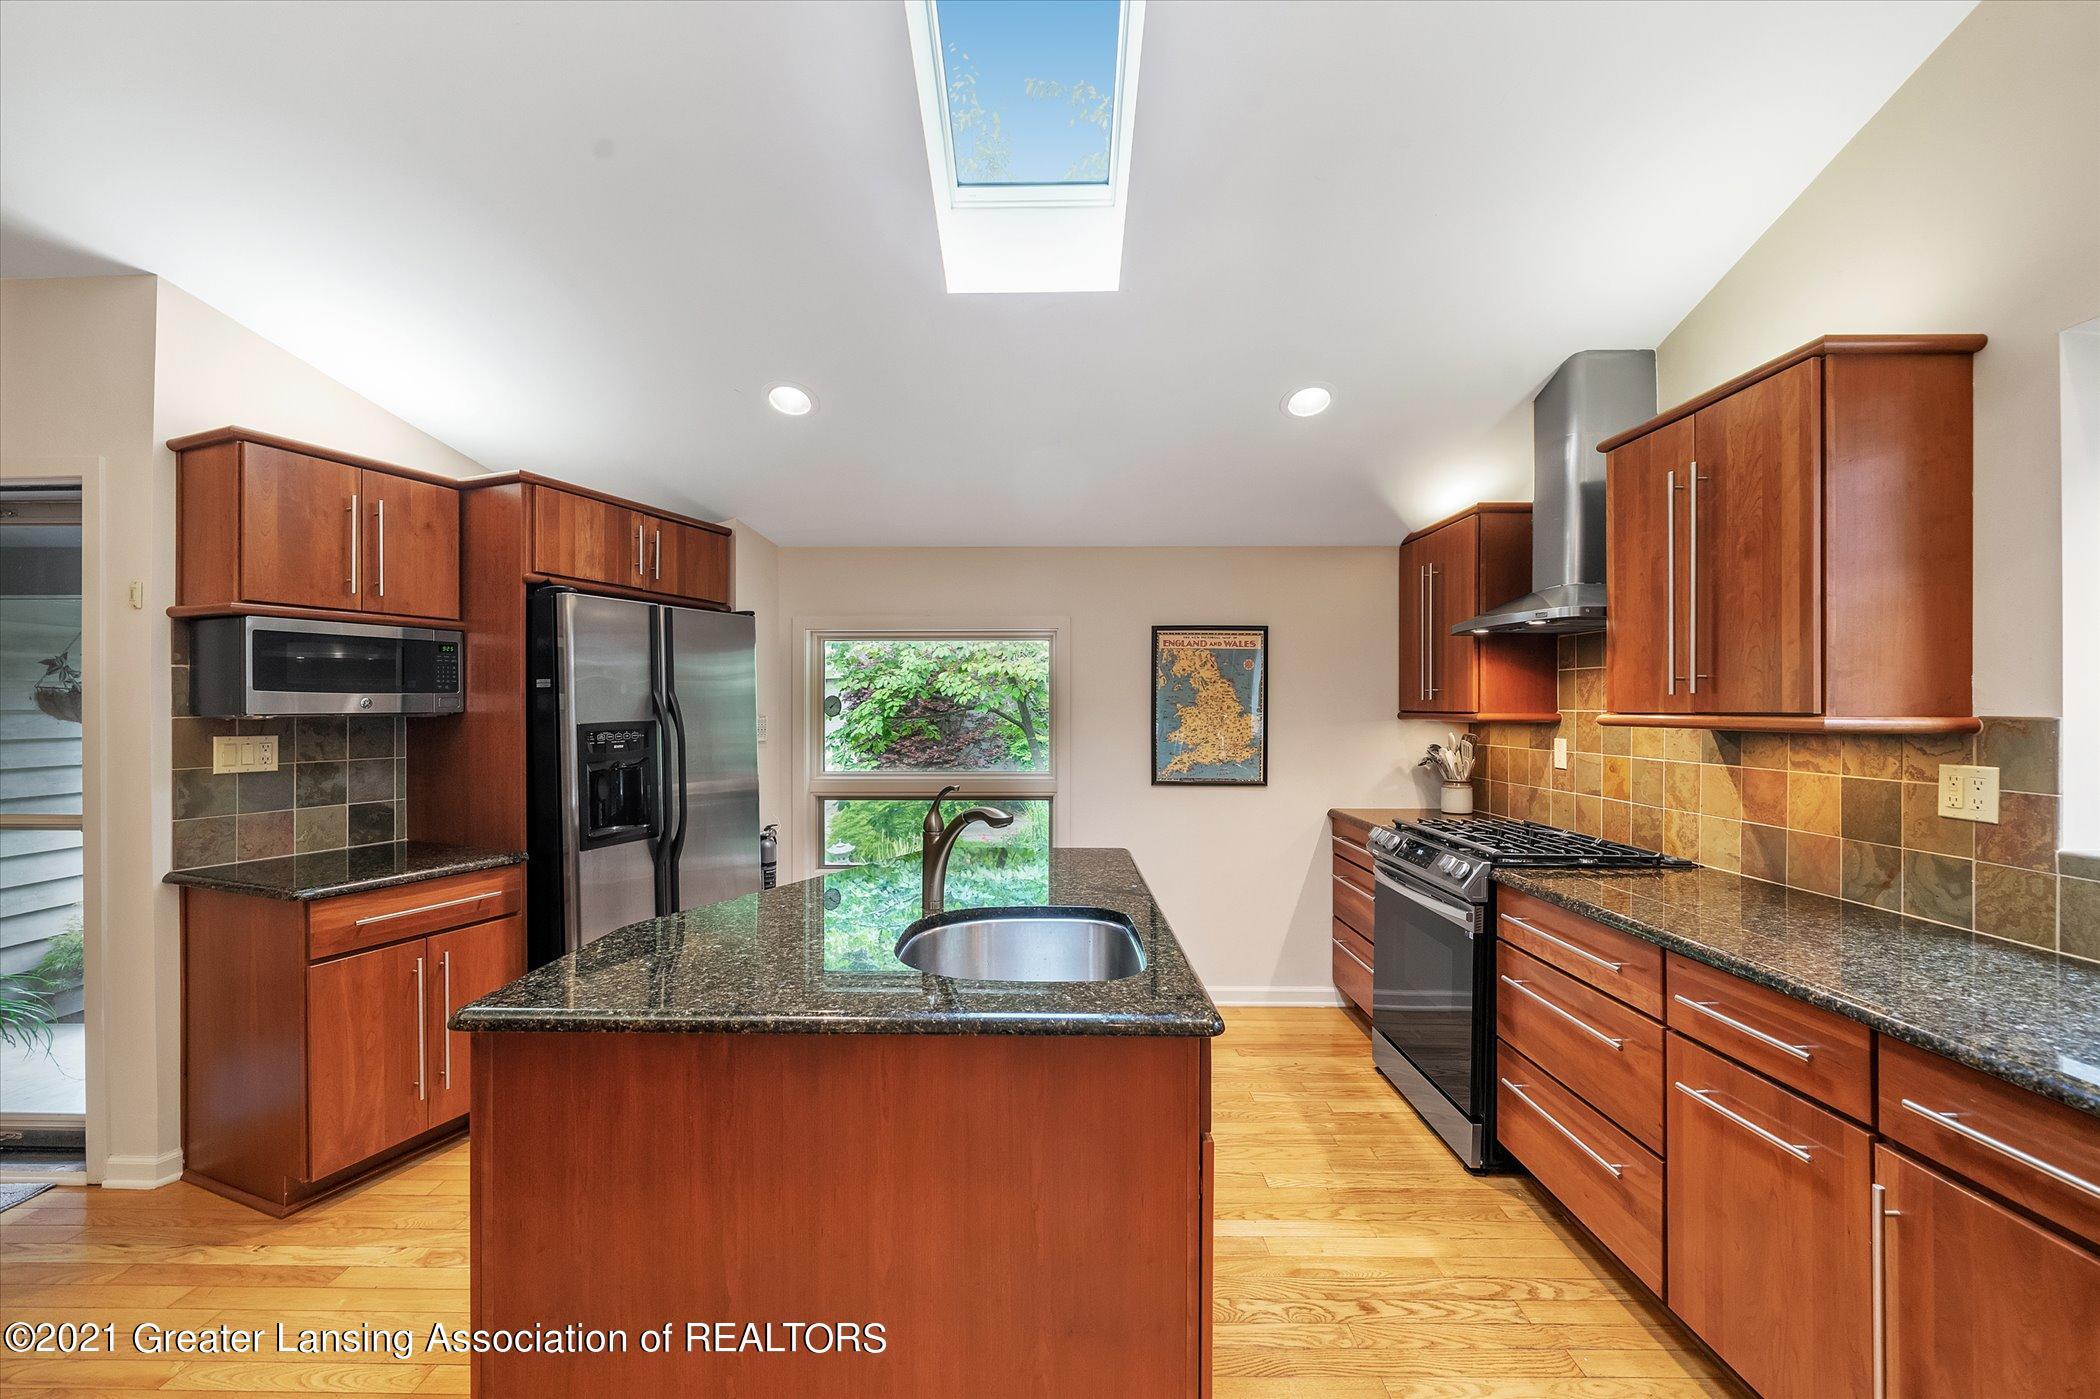 442 Shoesmith Rd - (13) MAIN FLOOR Kitchen - 14